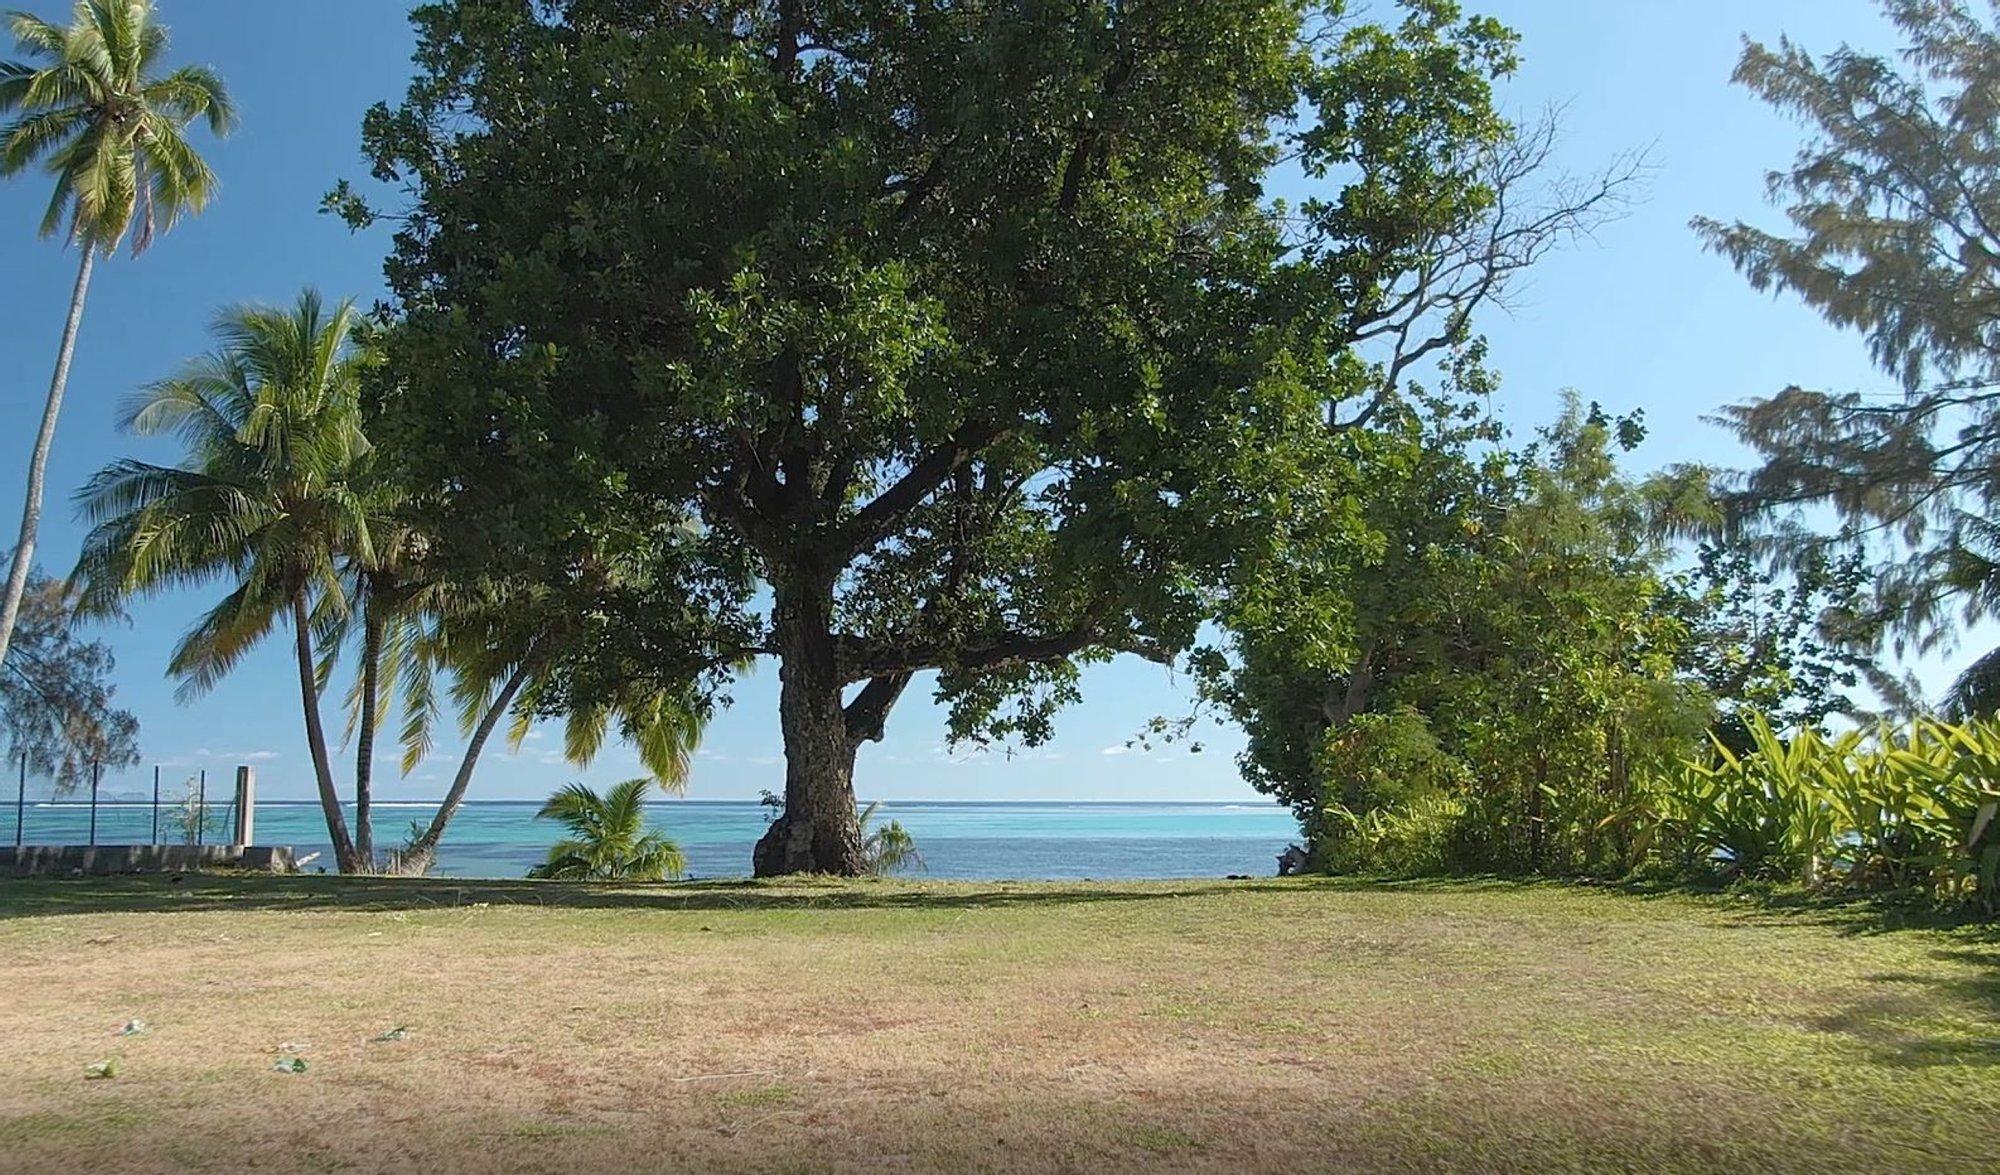 Land in Paopao, Windward Islands, French Polynesia 1